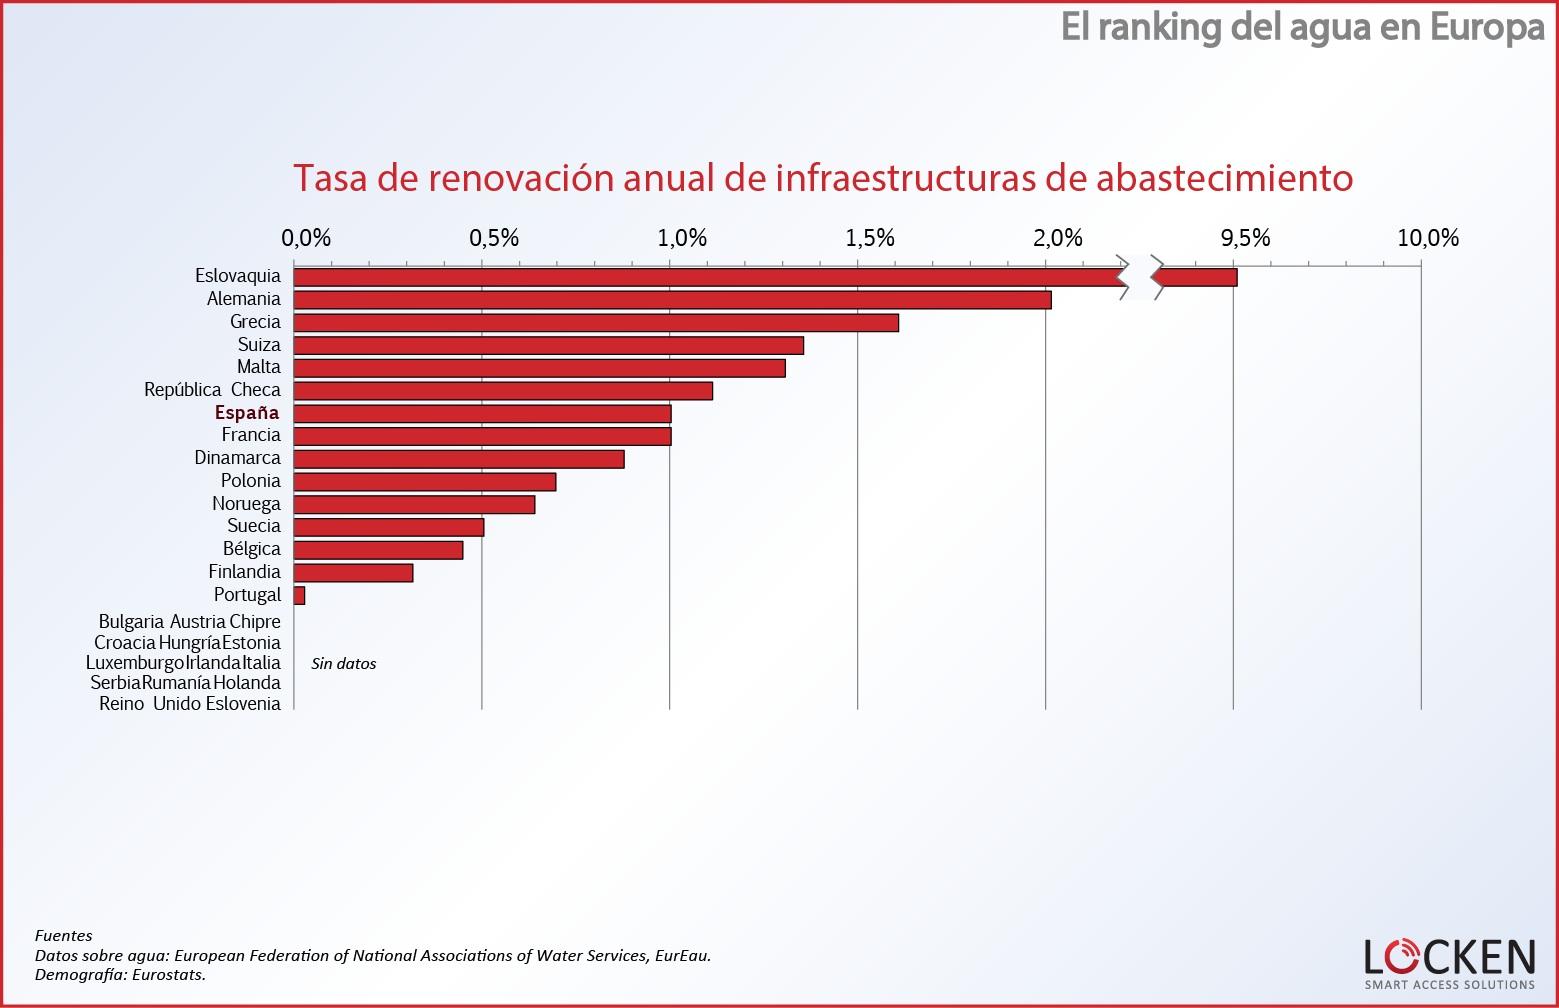 ranking-agua-europa-tasa-renovacion-anual 7